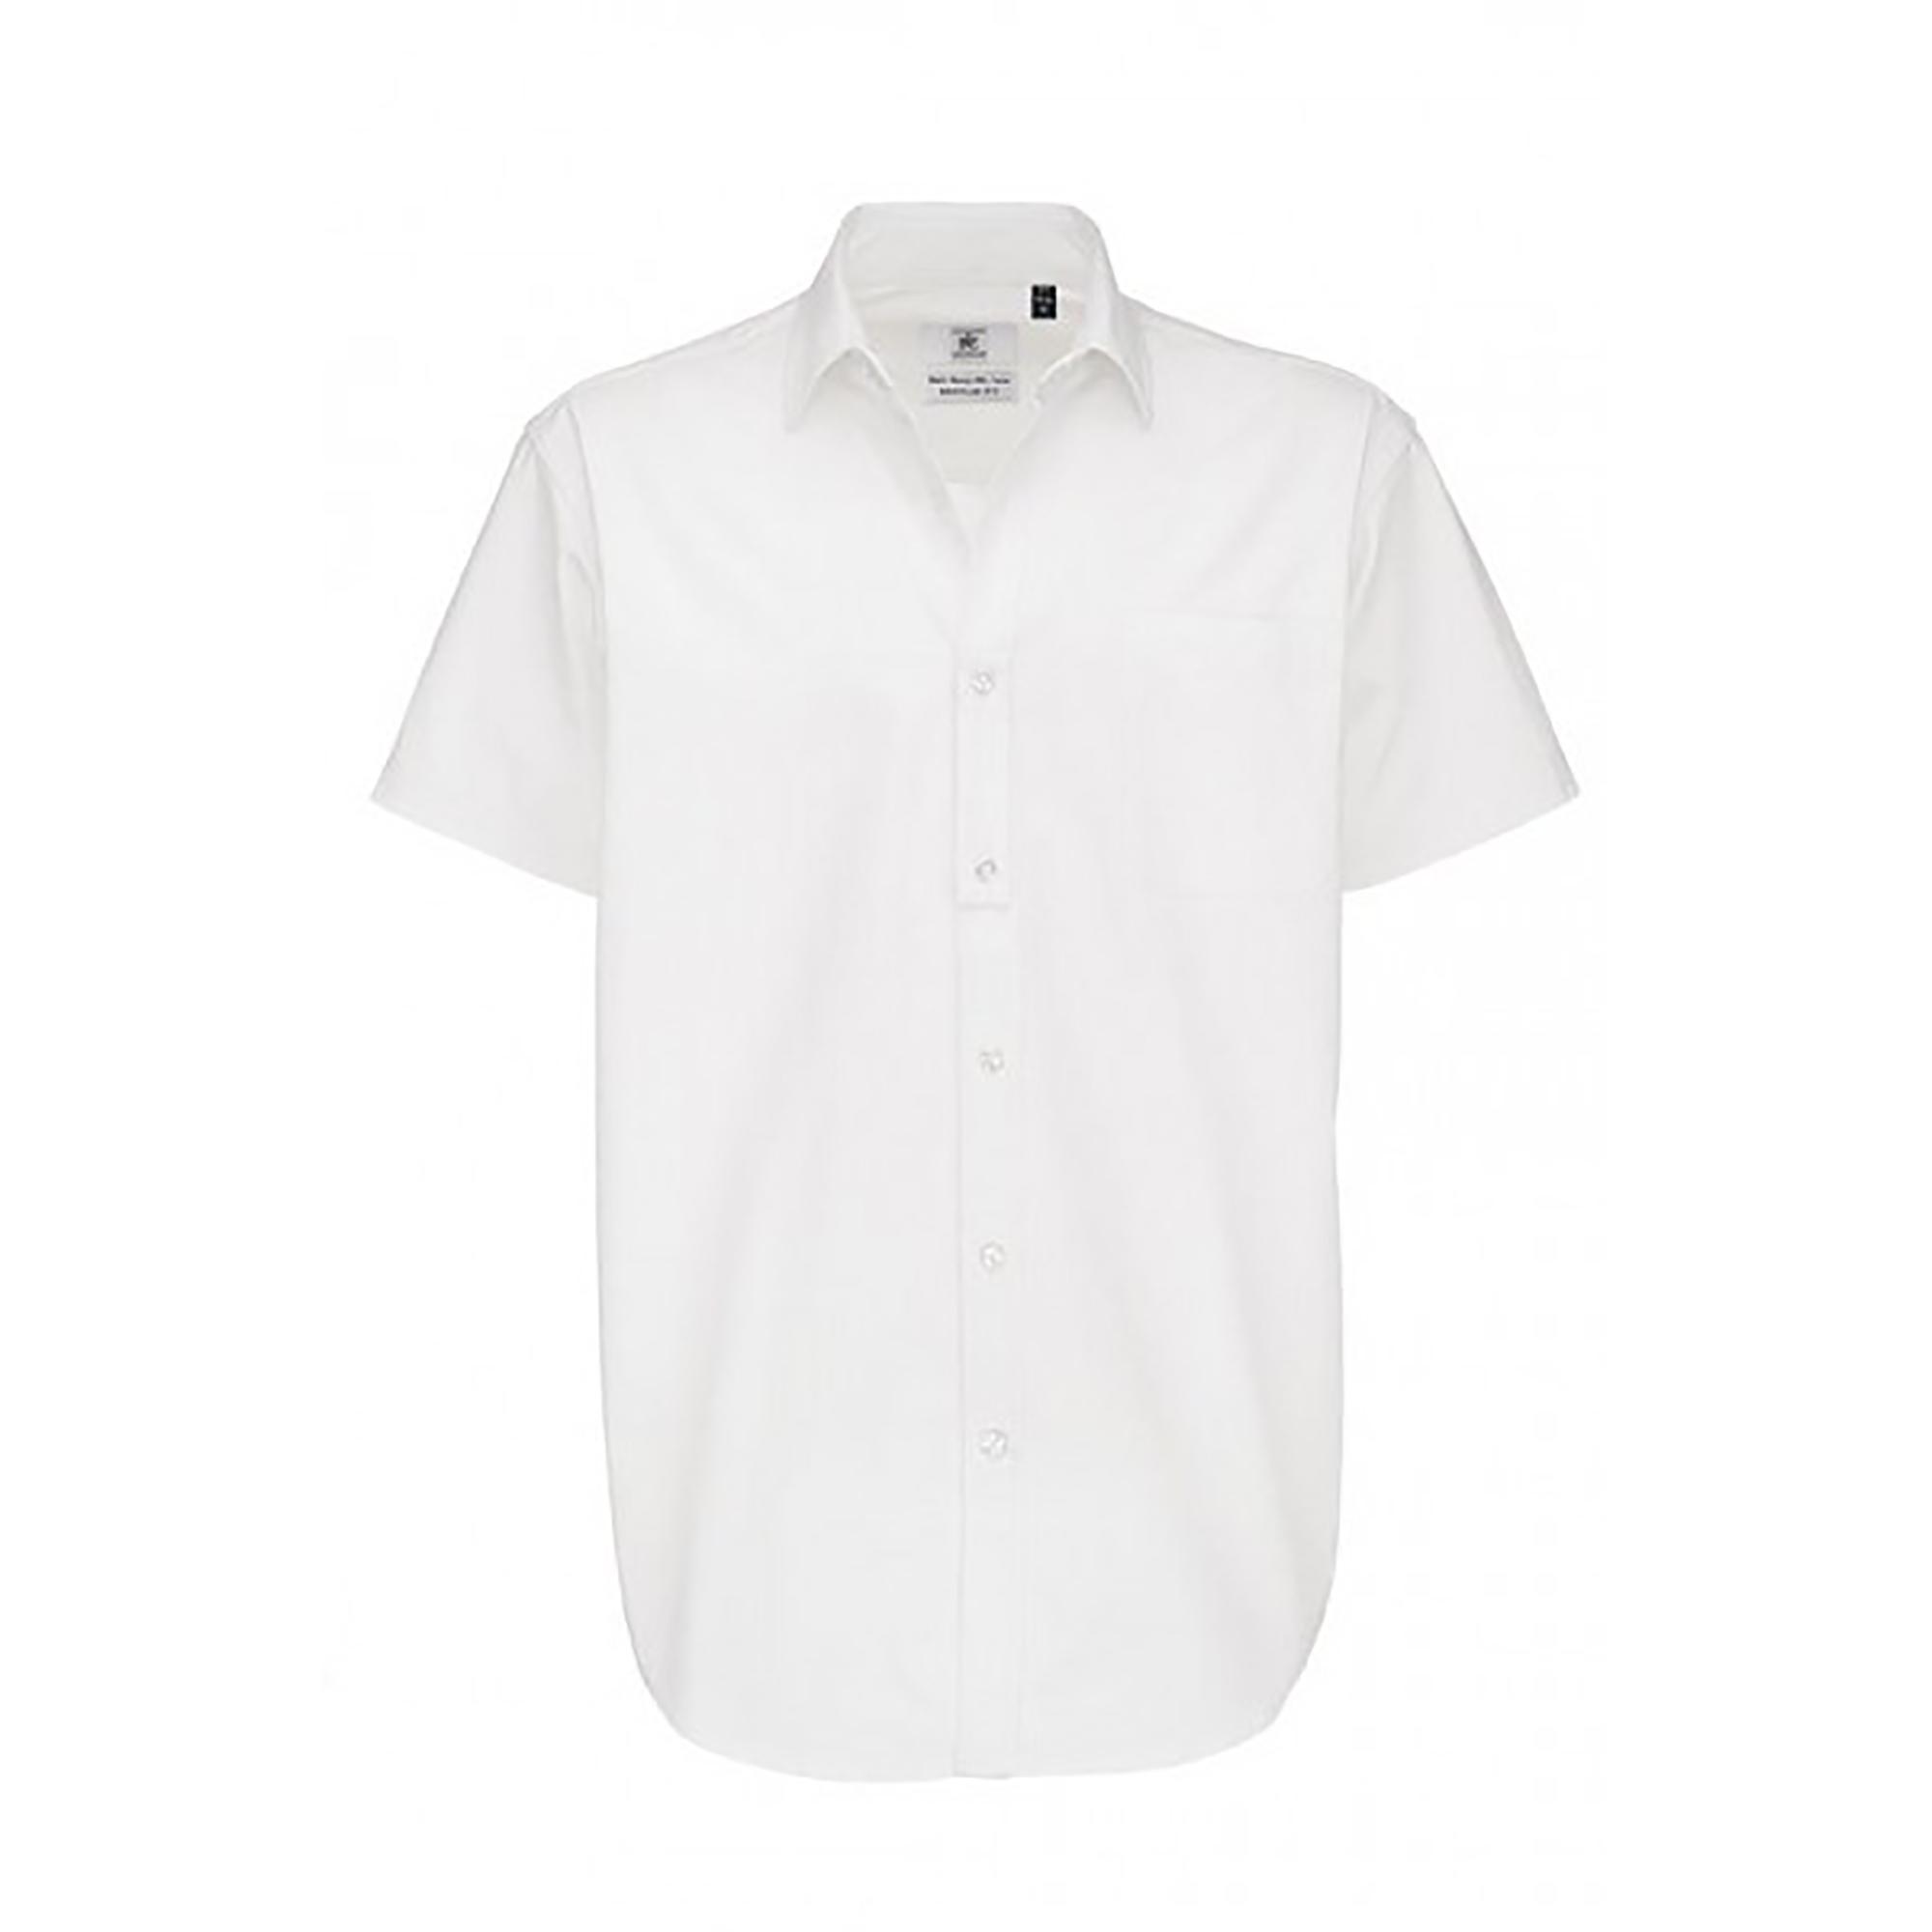 B&C Mens Sharp Twill Short Sleeve Shirt / Mens Shirts (XL) (White)